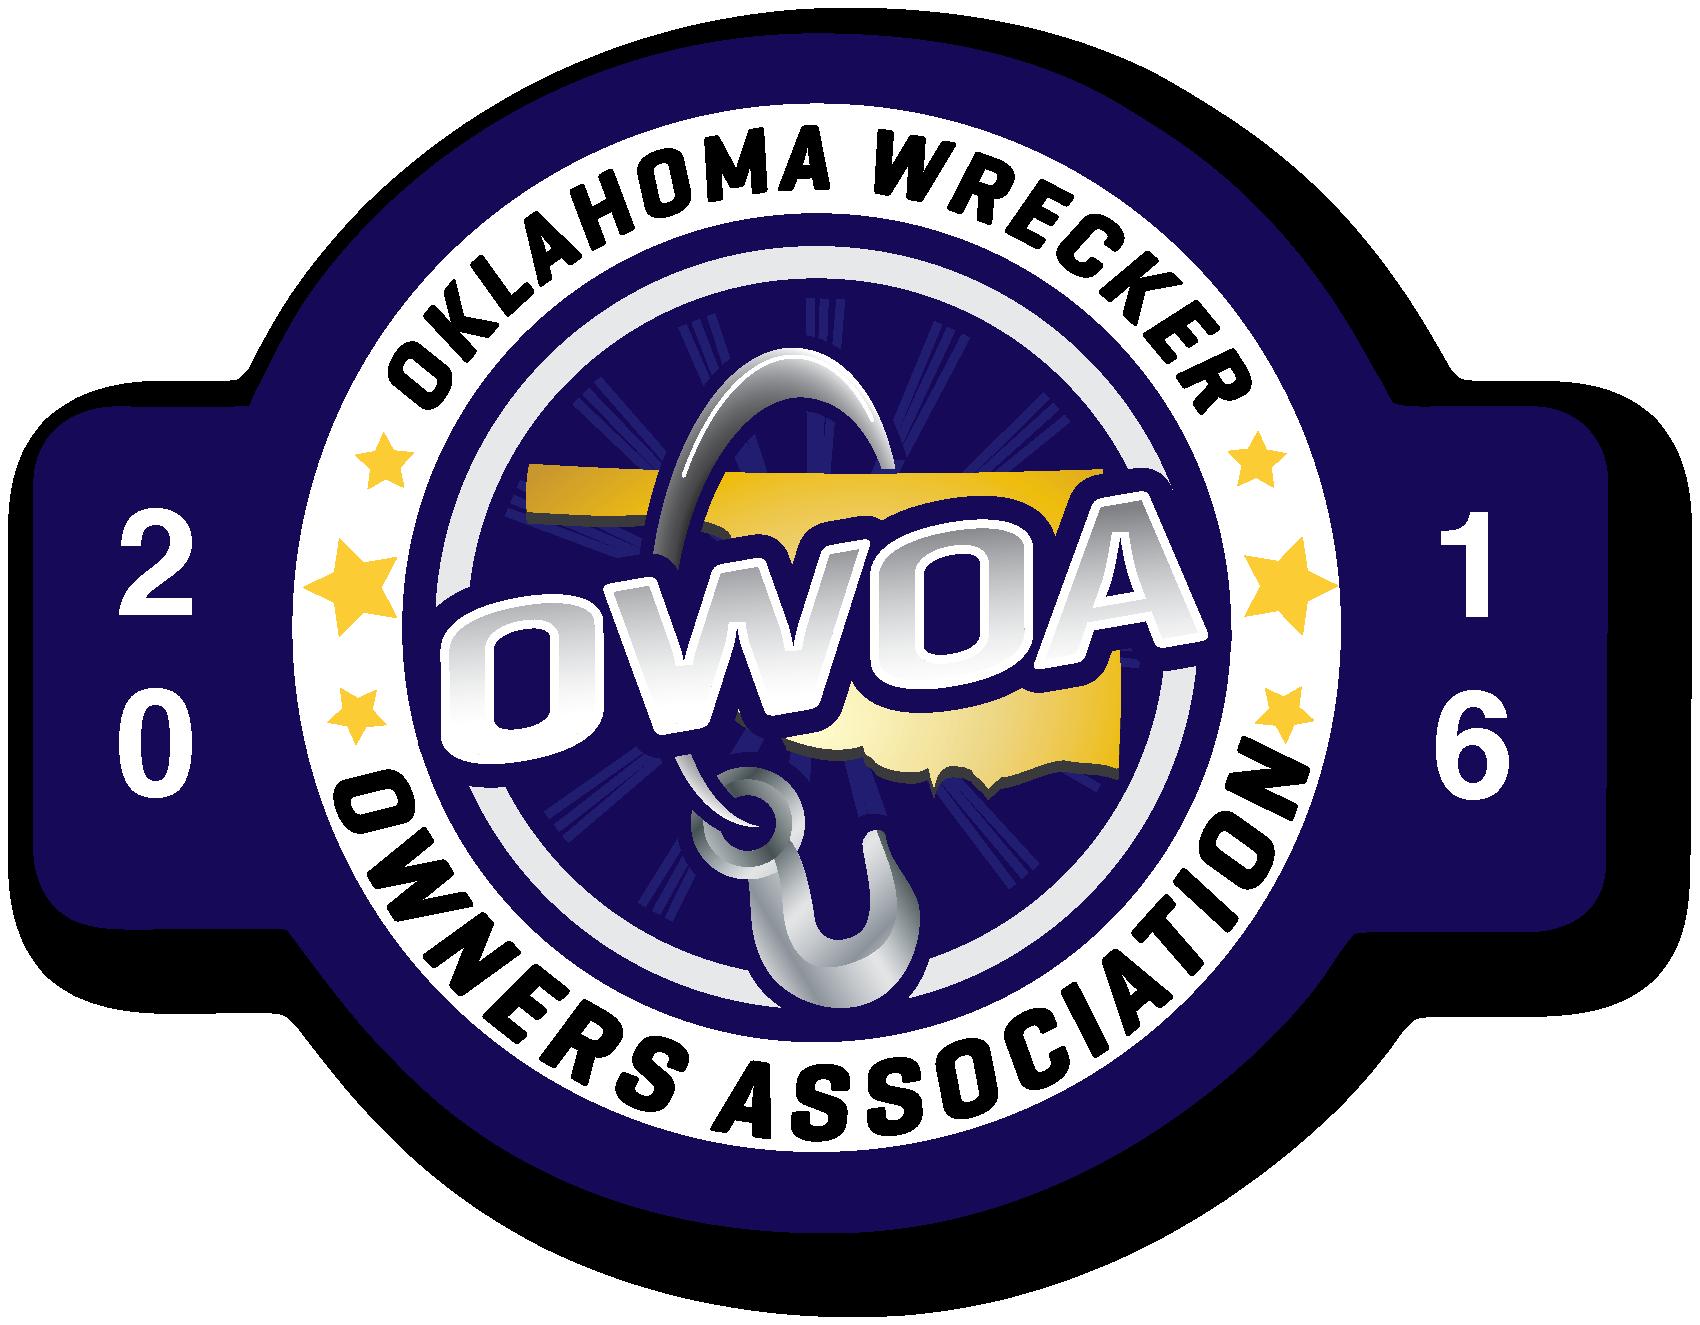 Membership/Association Decals